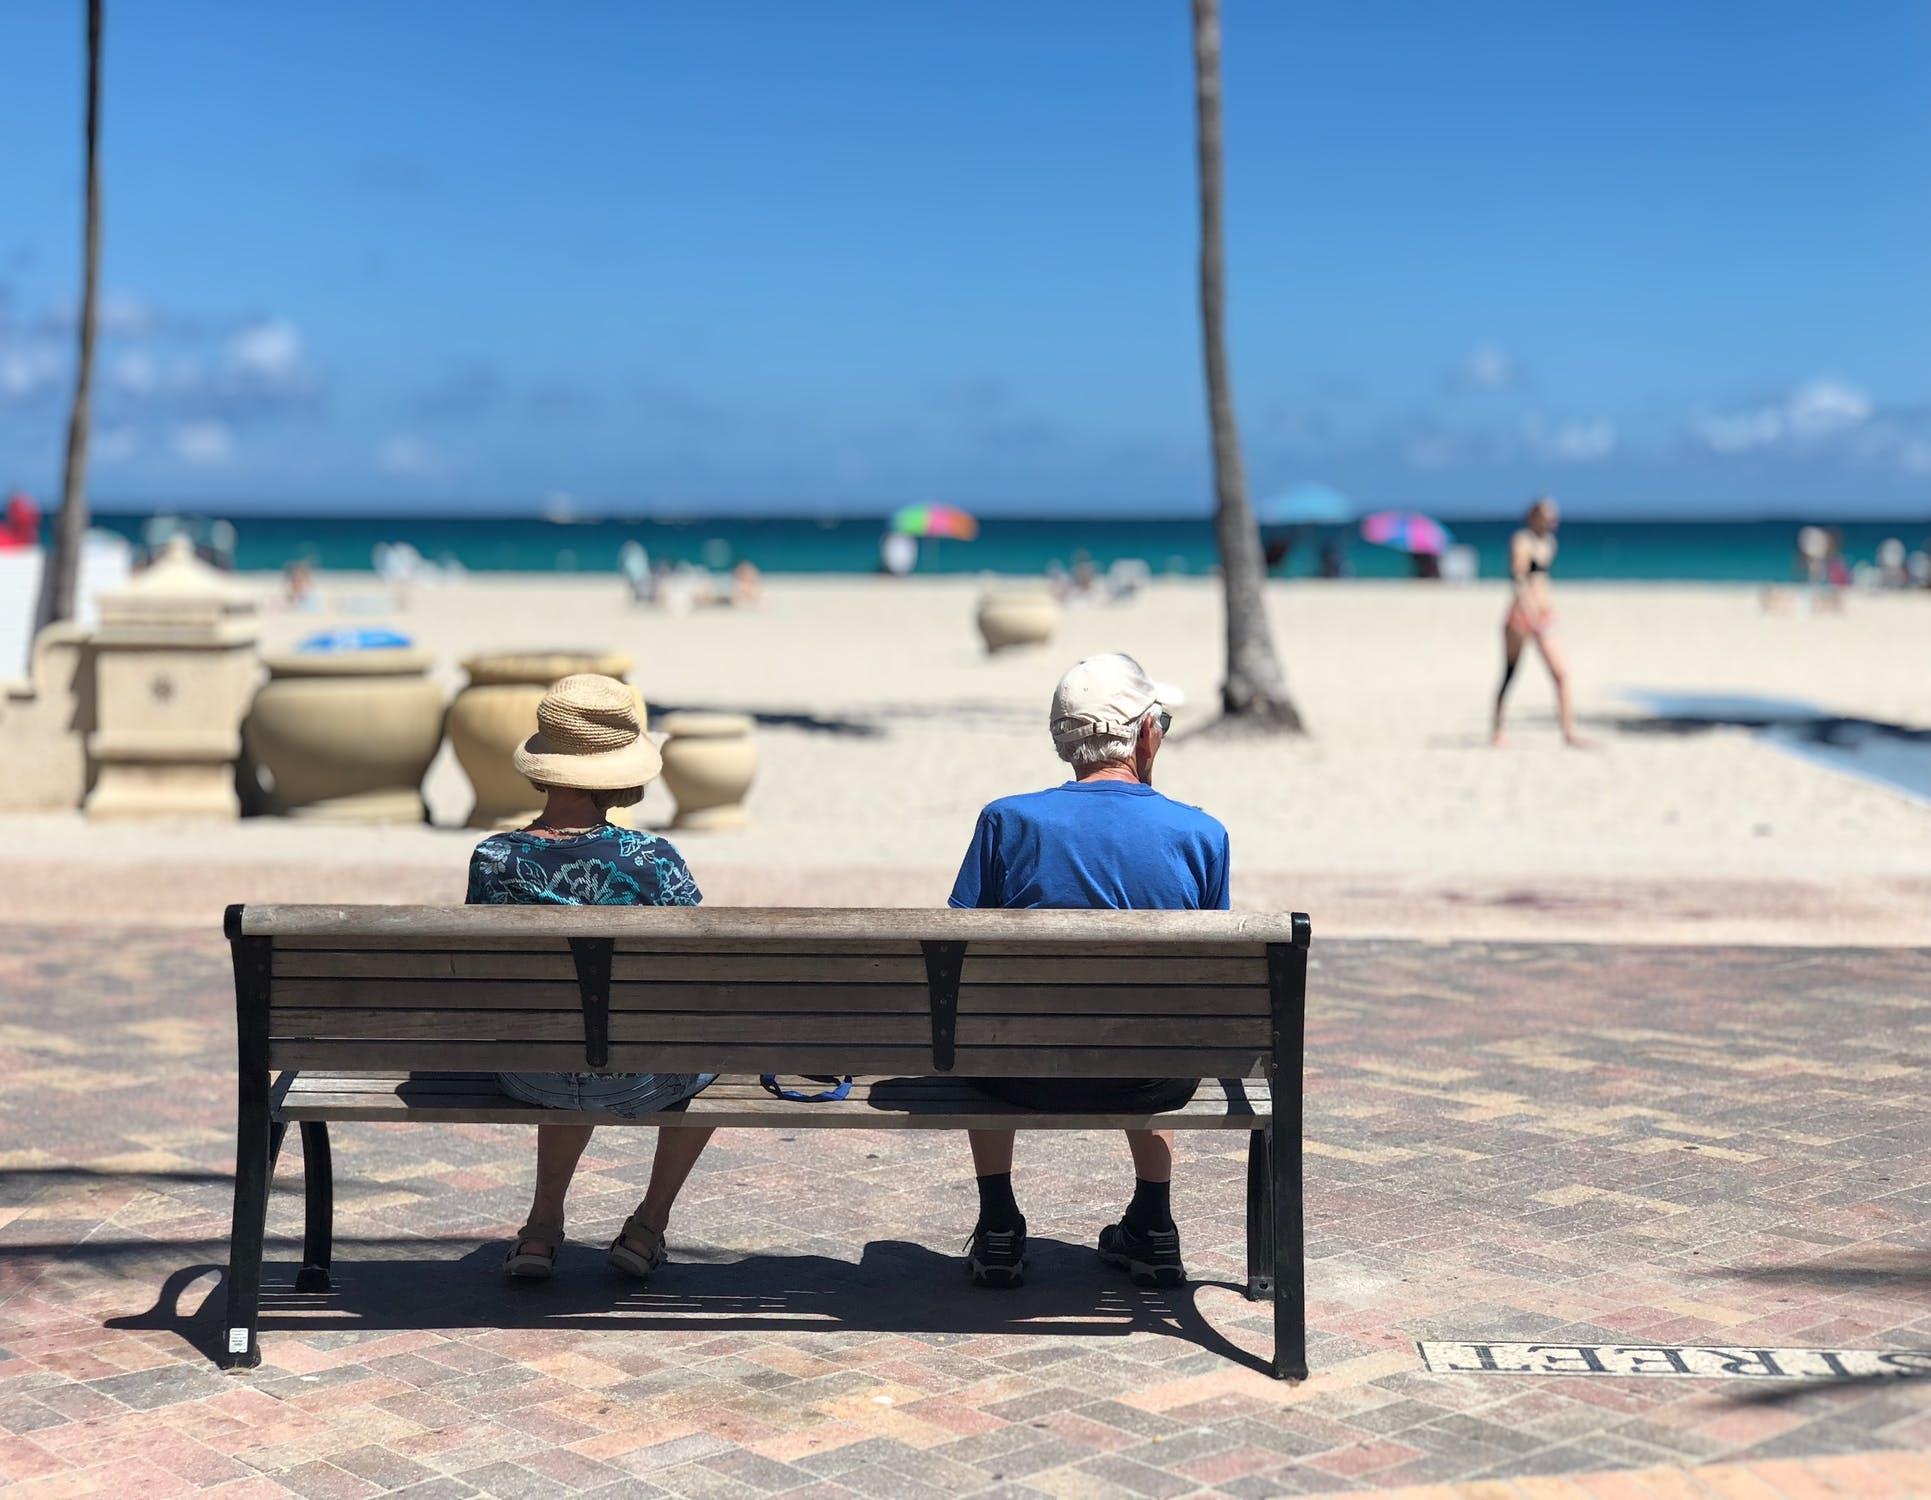 Logements senior : les aides financières disponibles